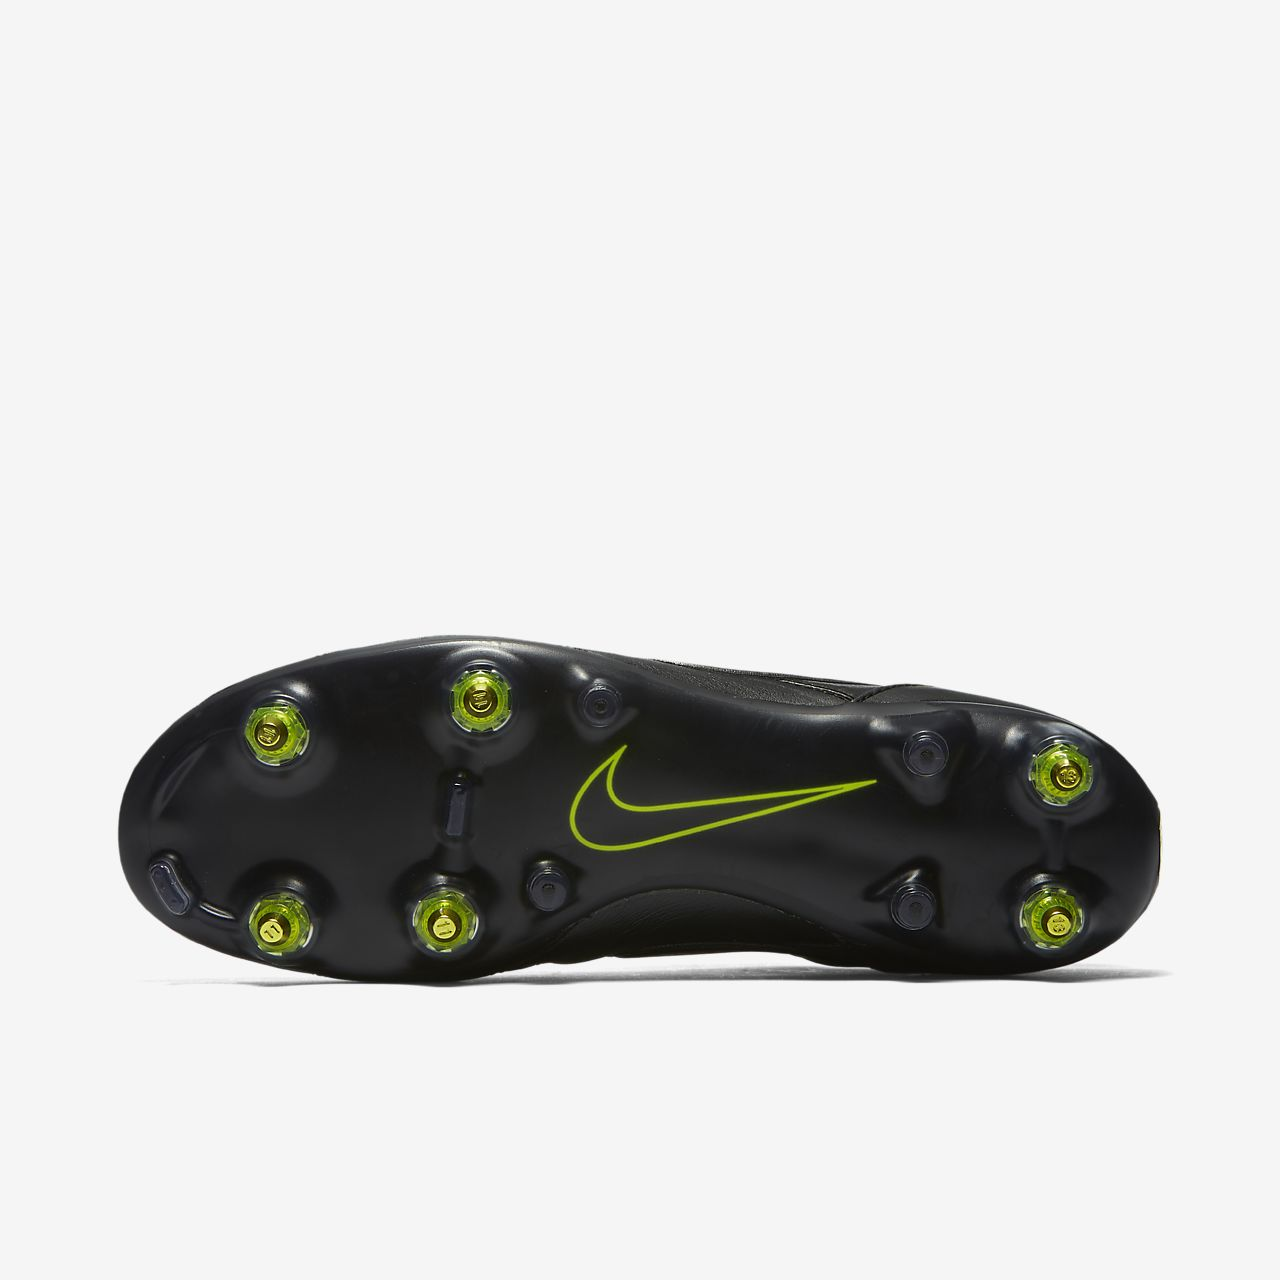 Chaussure Premier Crampons Ii Nike Terrain Football À Gras Pour De UqwagSU